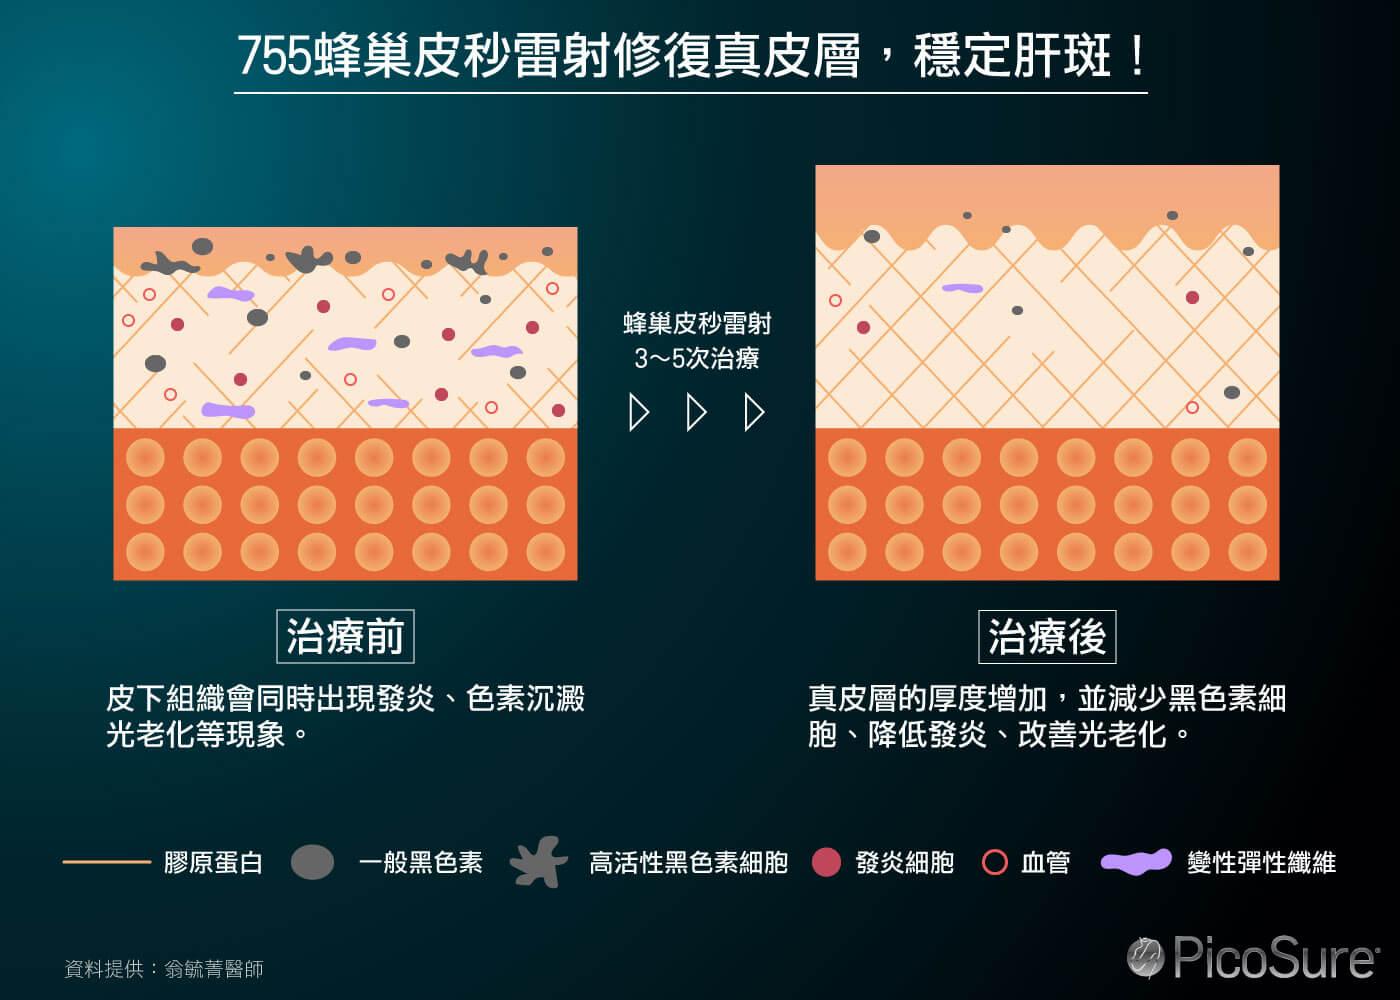 PicoSure755蜂巢皮秒雷射治療肝斑效果佳